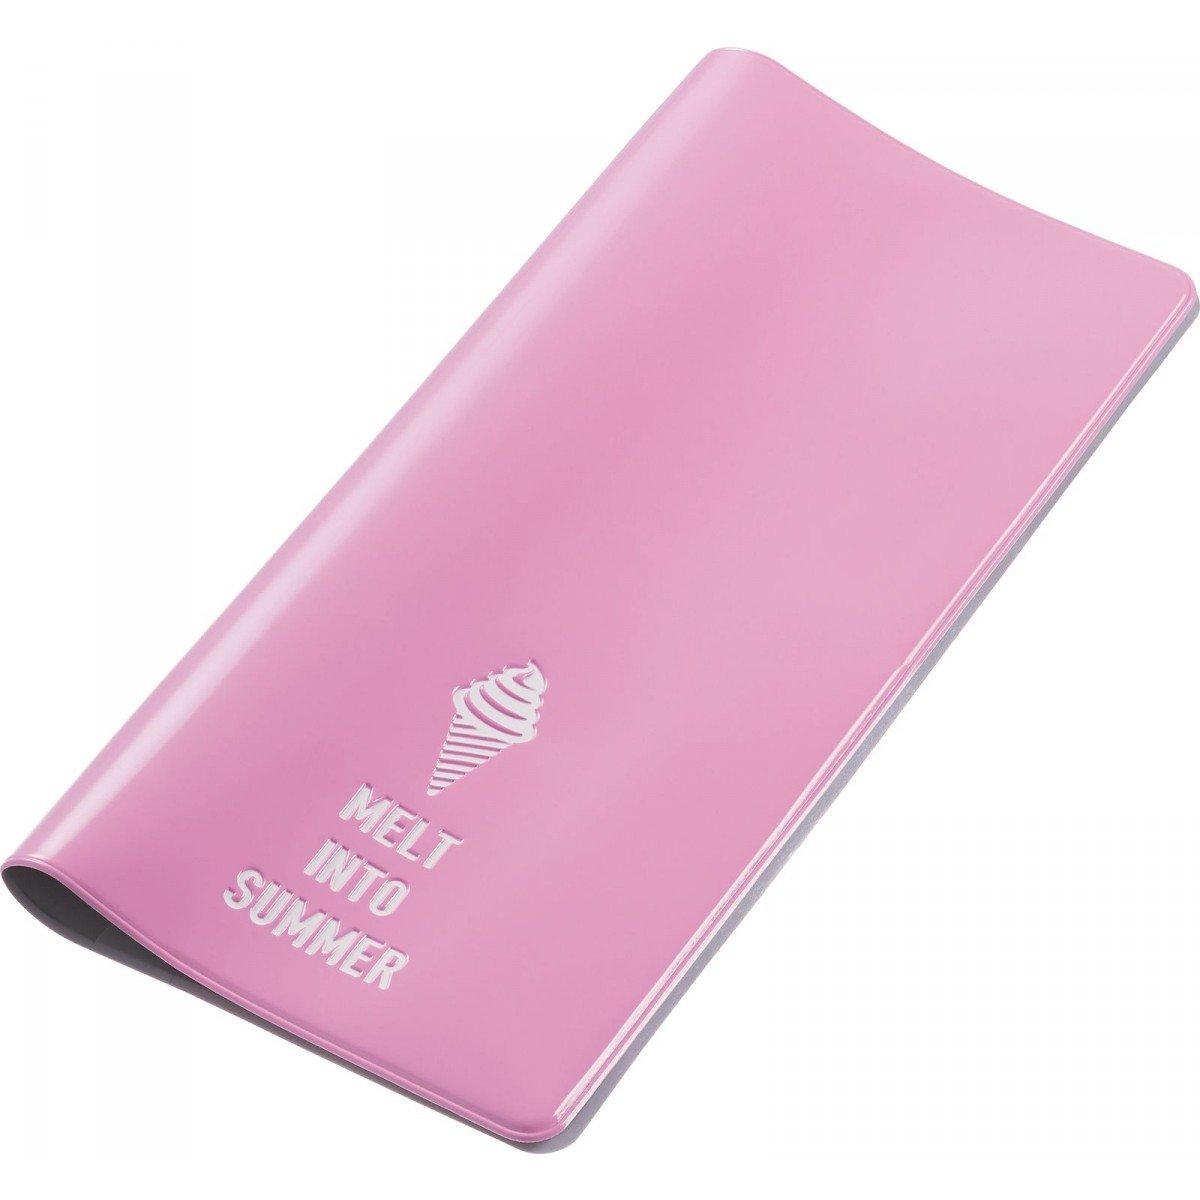 Go Travel GLO Wallet Organiser (Pink 'Melt Into Summer')